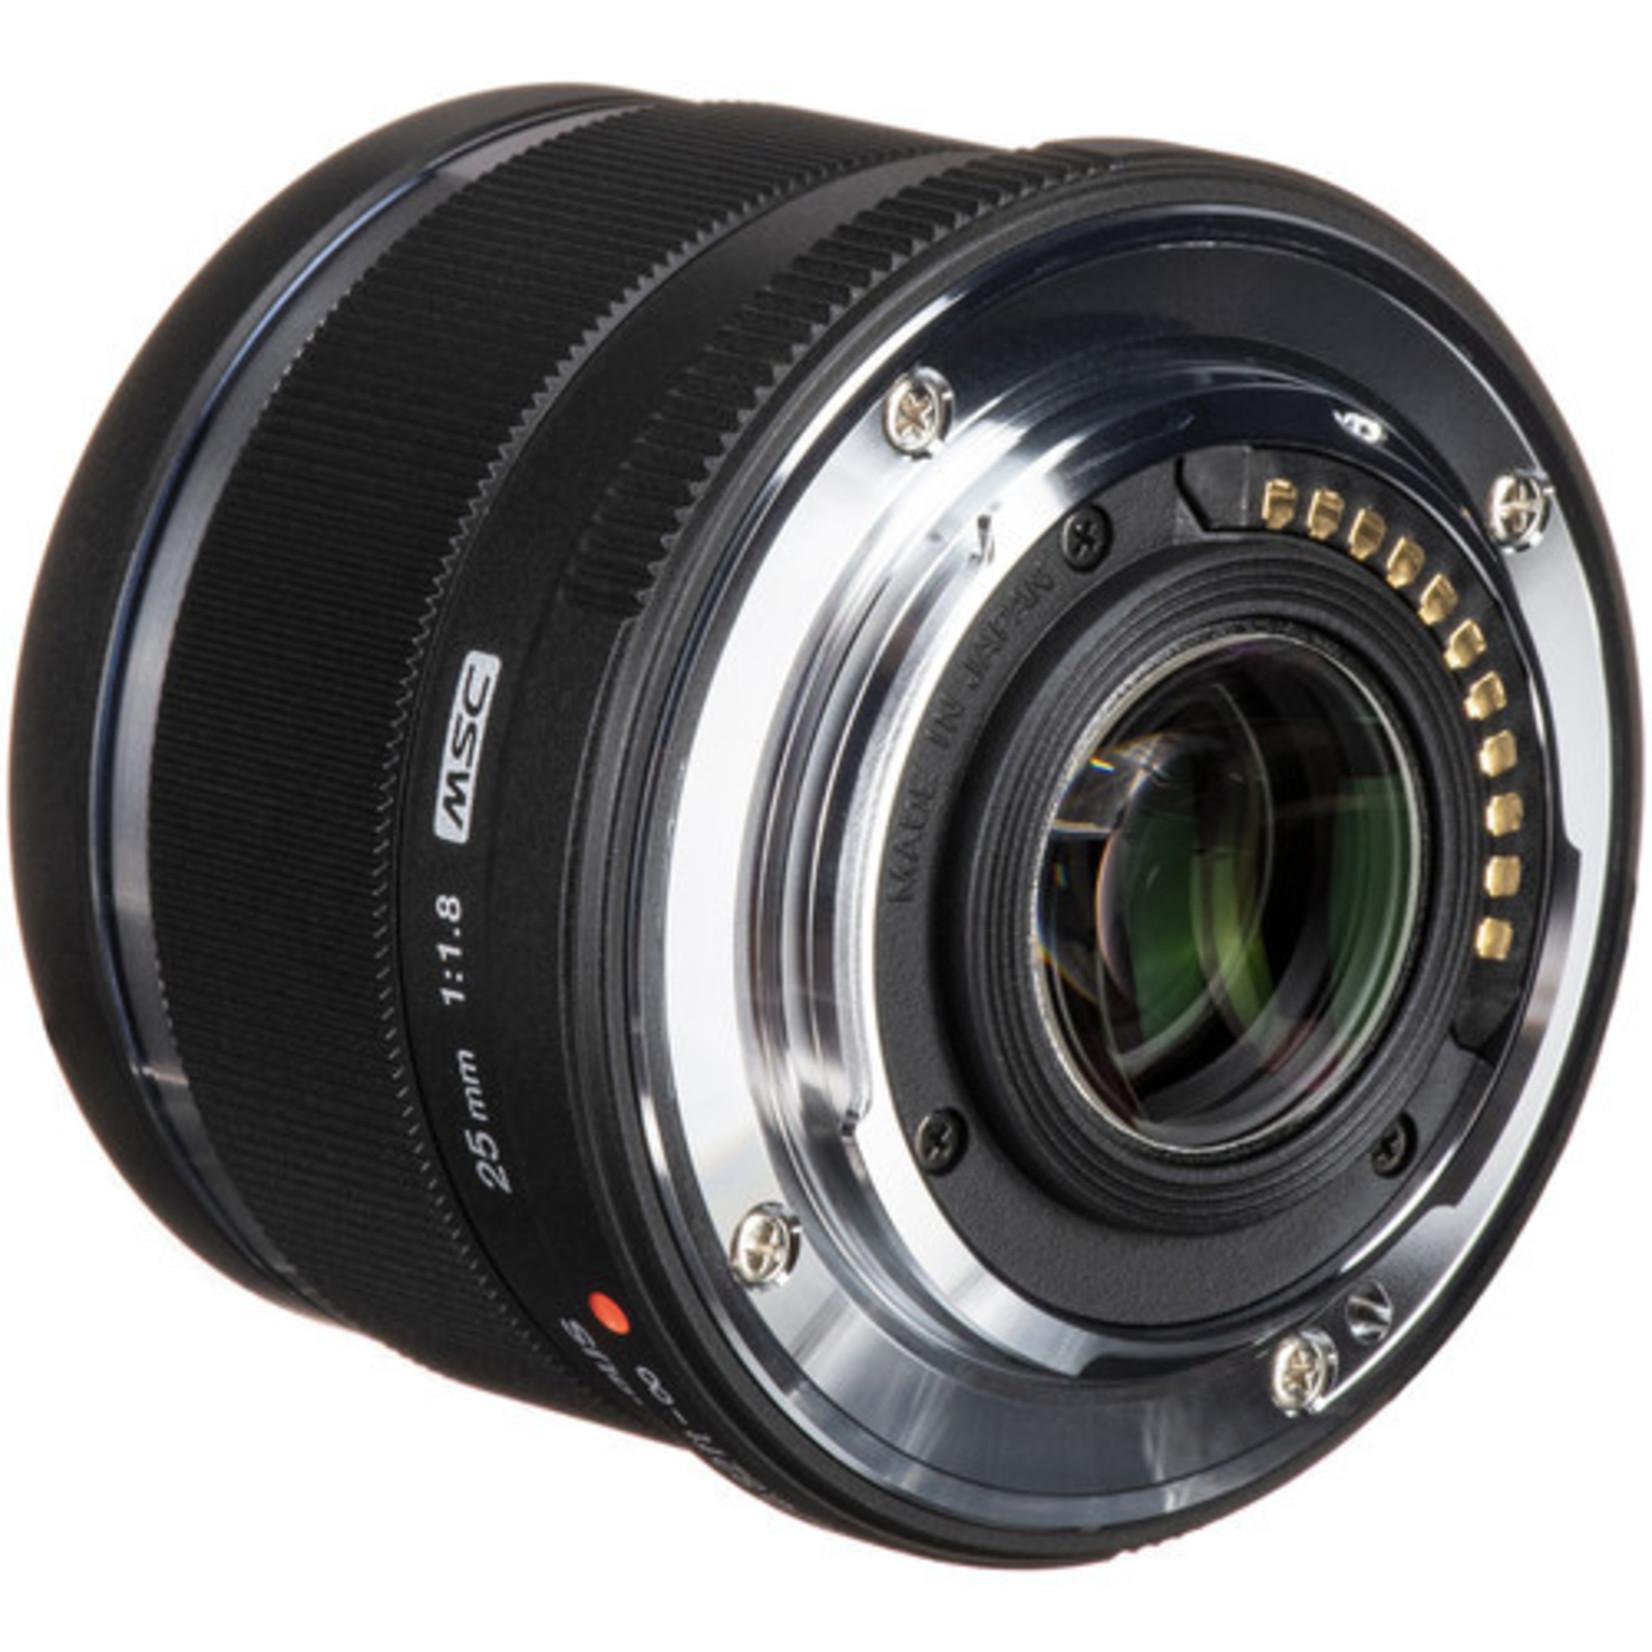 Olympus Olympus M.Zuiko Digital 25mm f/1.8 Lens (Black)